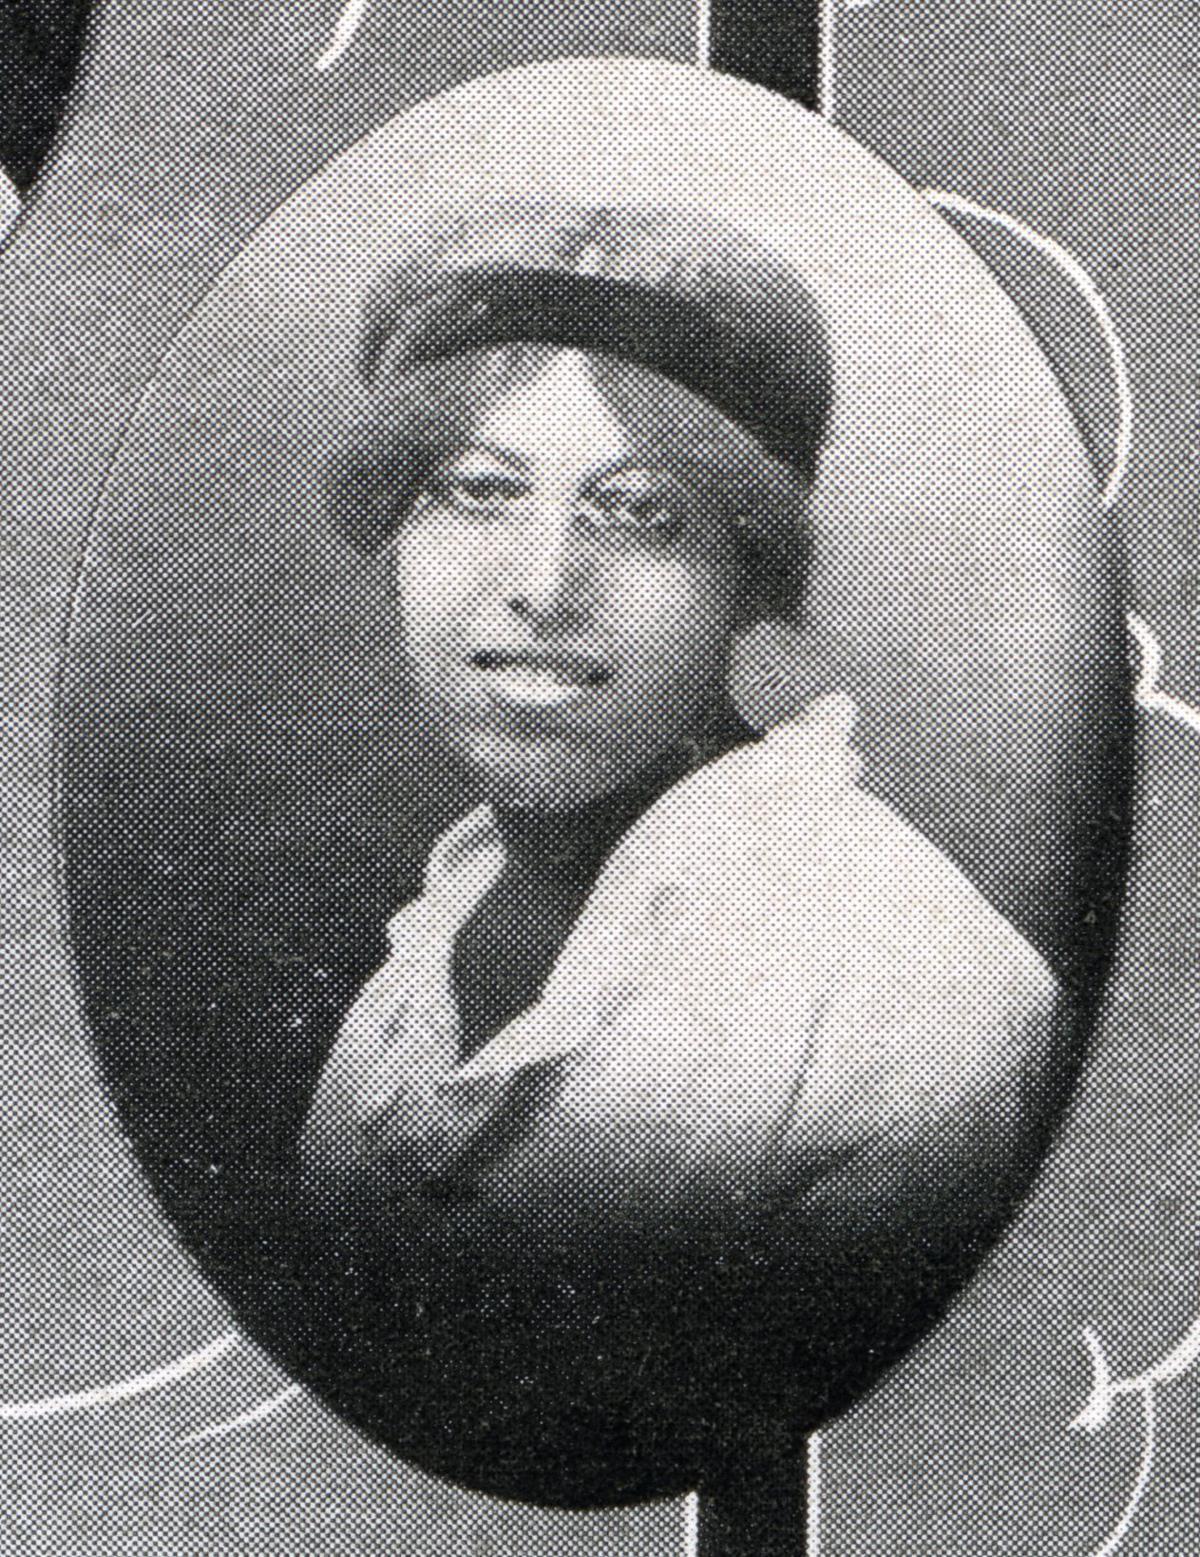 Lillian Smith Davenport